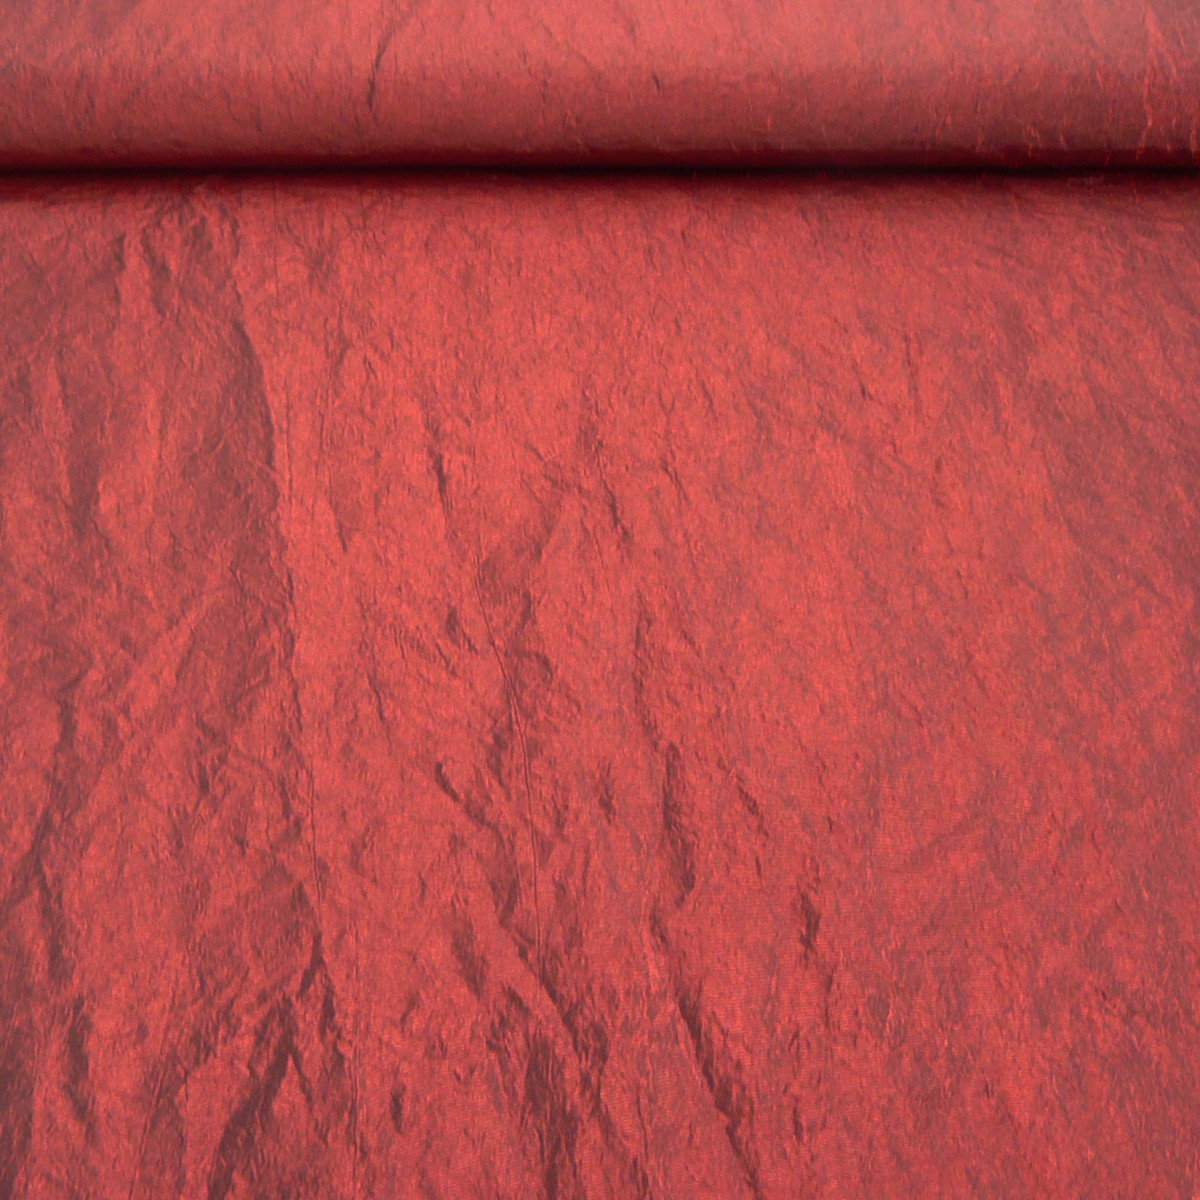 Bekleidungsstoff Taft dunkelrot 1,4m Breite